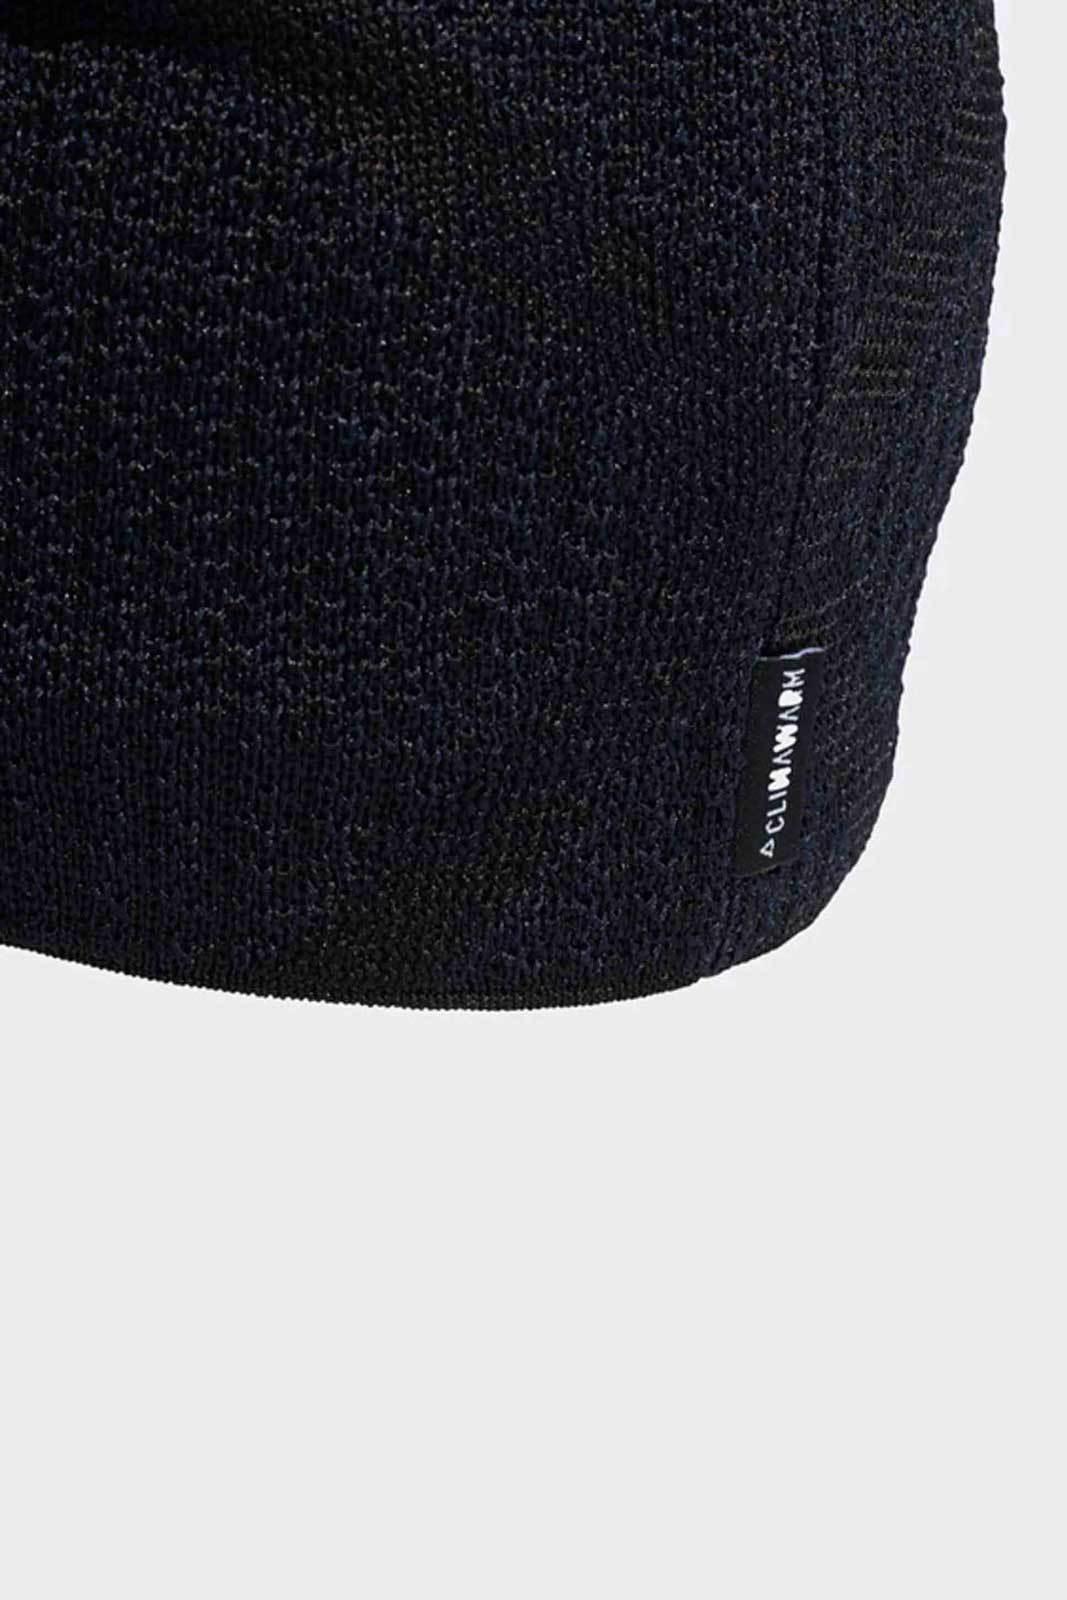 410db578379 Adidas - Blue Z.n.e. Parley Climawarm Beanie for Men - Lyst. View fullscreen